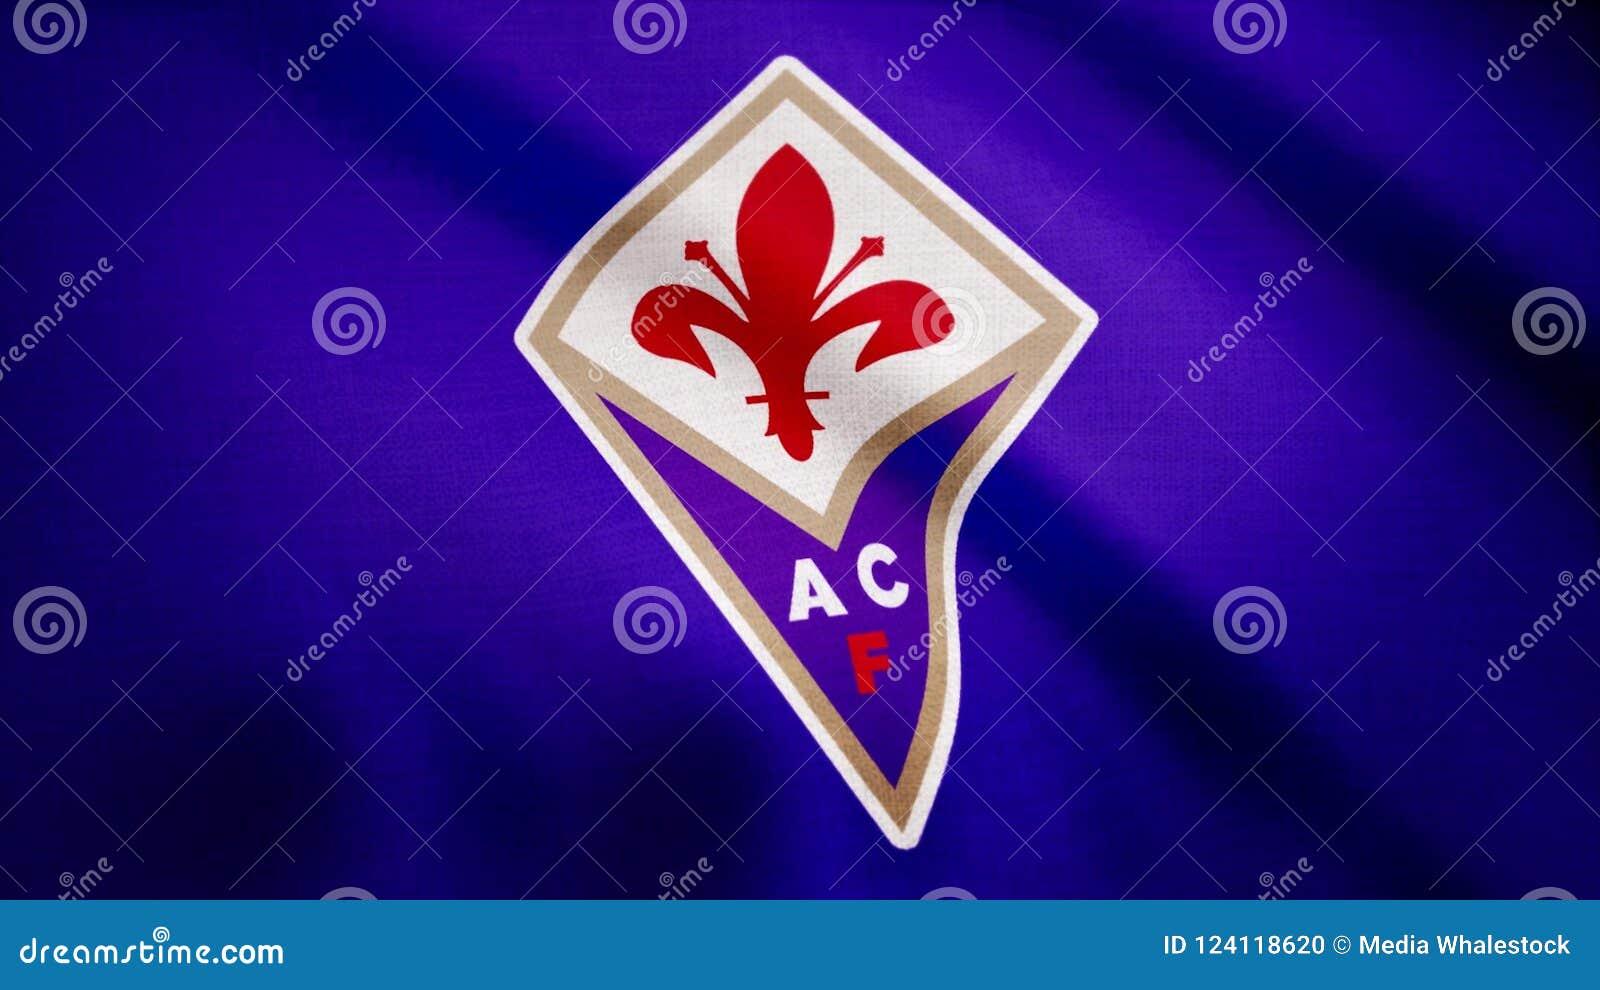 d077fed95c6 Close-up Of Waving Flag With FC Fiorentina Football Club Logo ...